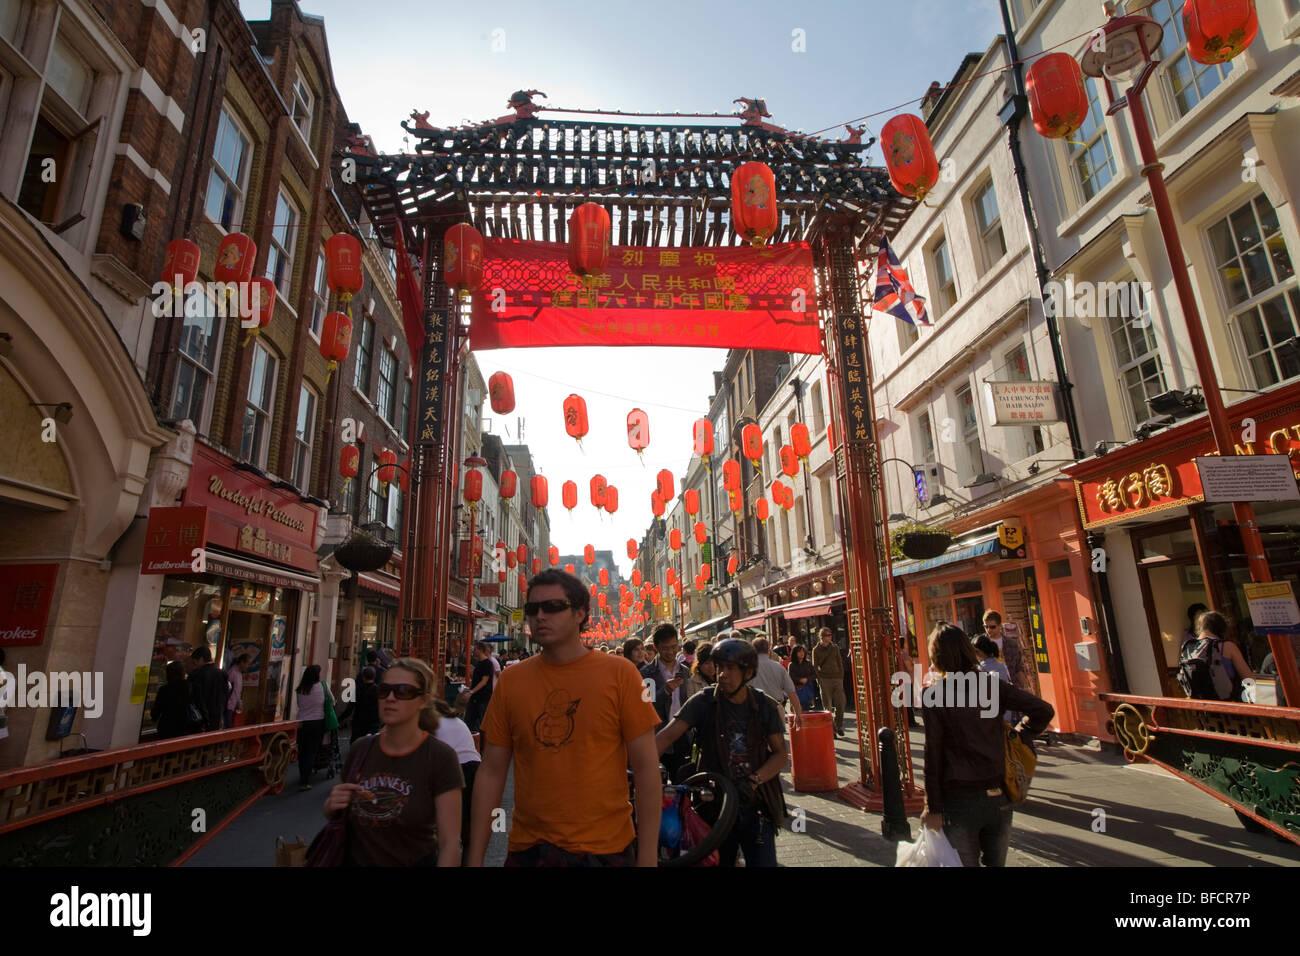 China town London - Stock Image